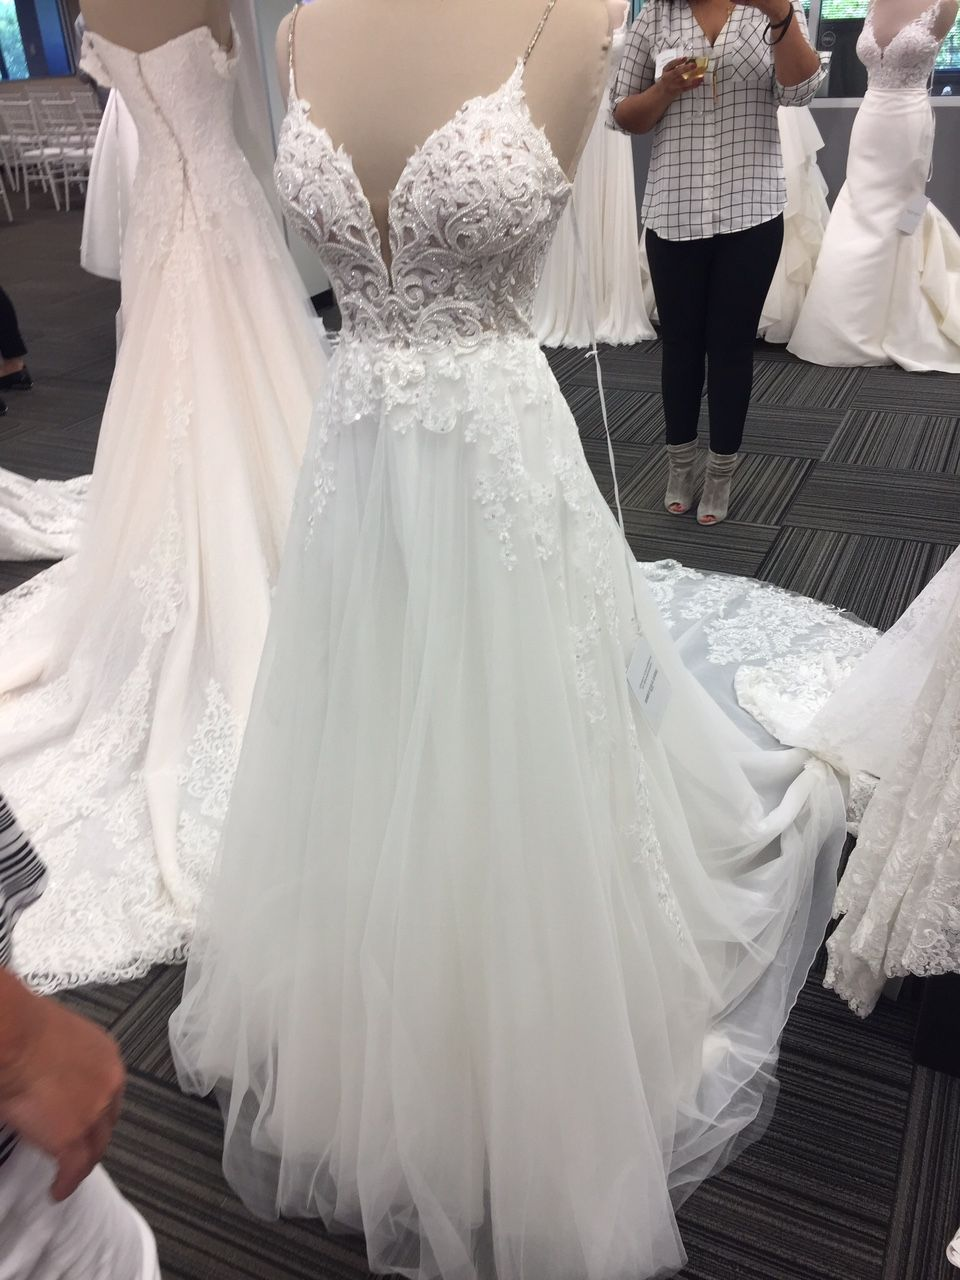 Martina Liana 950 Town And Country Bridal Boutique St Louis Mo Www Townandcountrybride C Wedding Dresses Princess Ballgown Wedding Dresses Elegant Bride